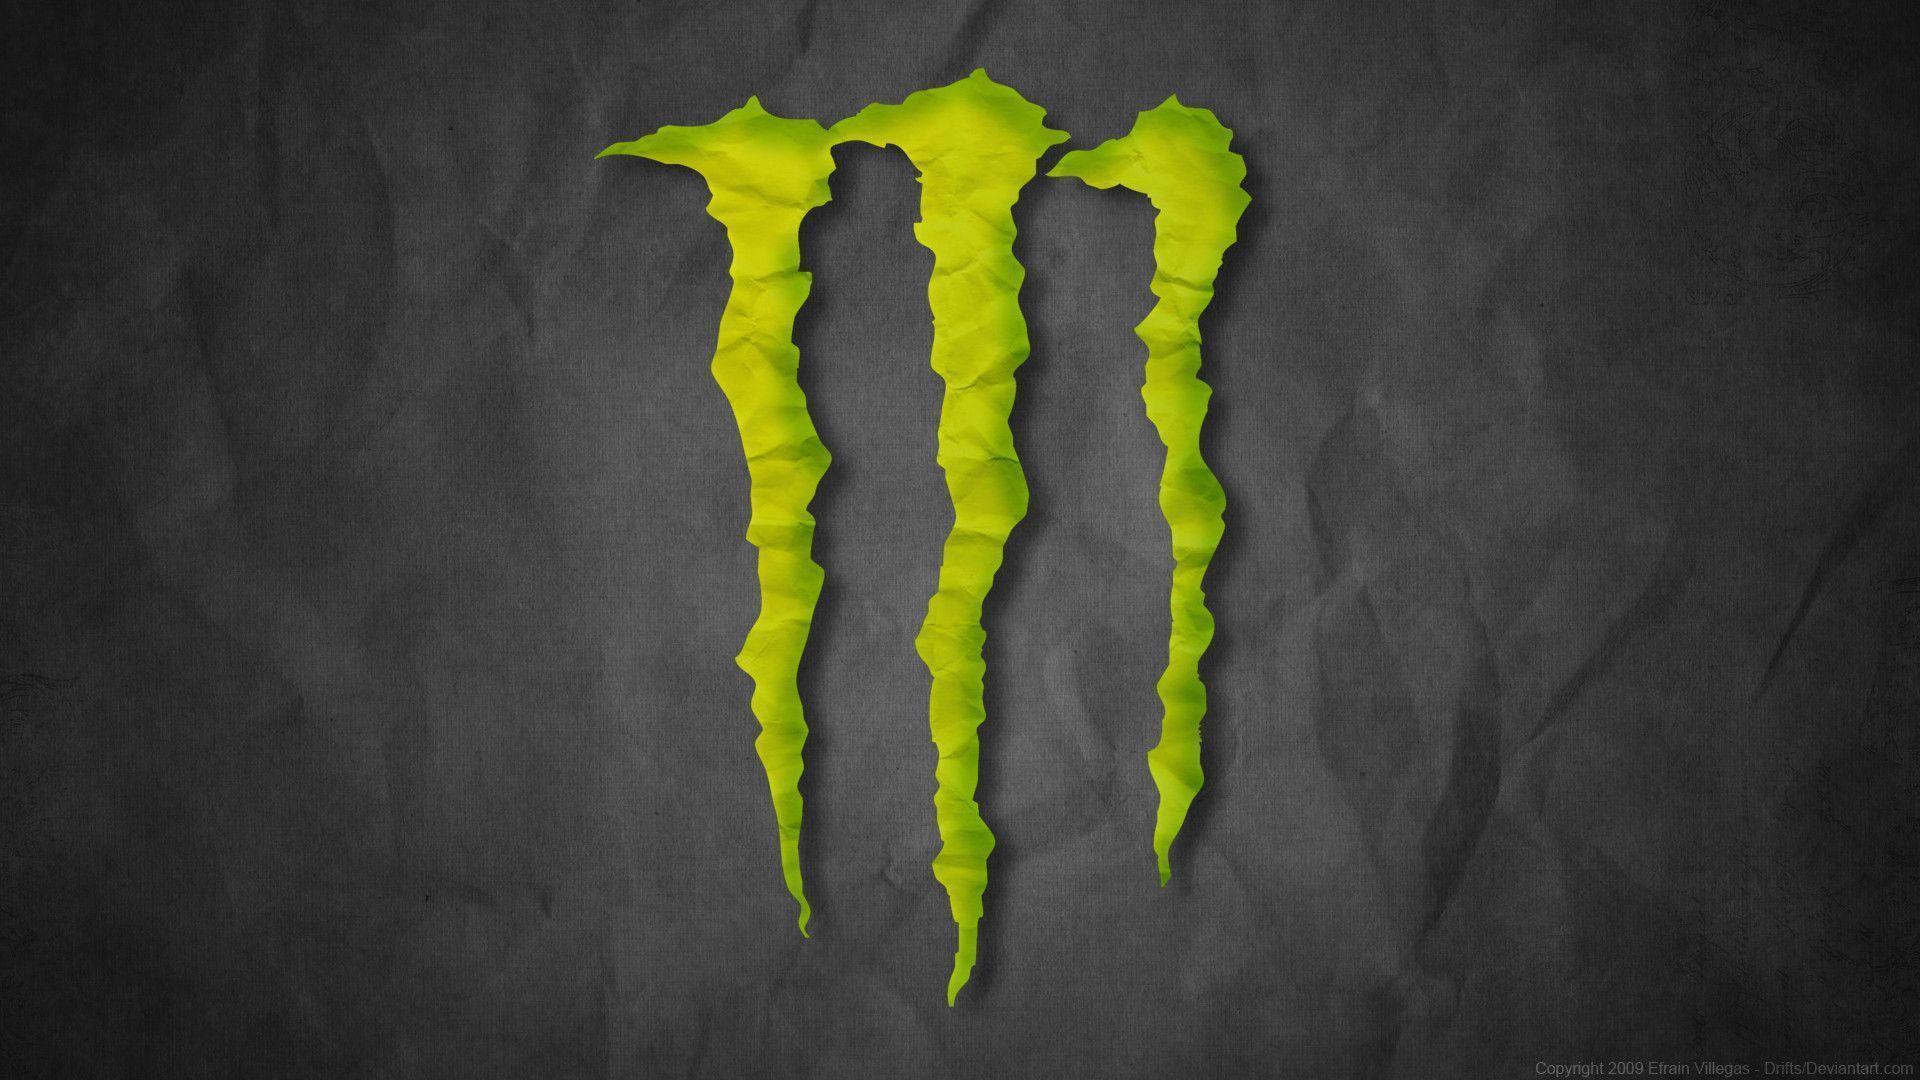 Imágenes de Monster energy [Megapost] - Taringa!